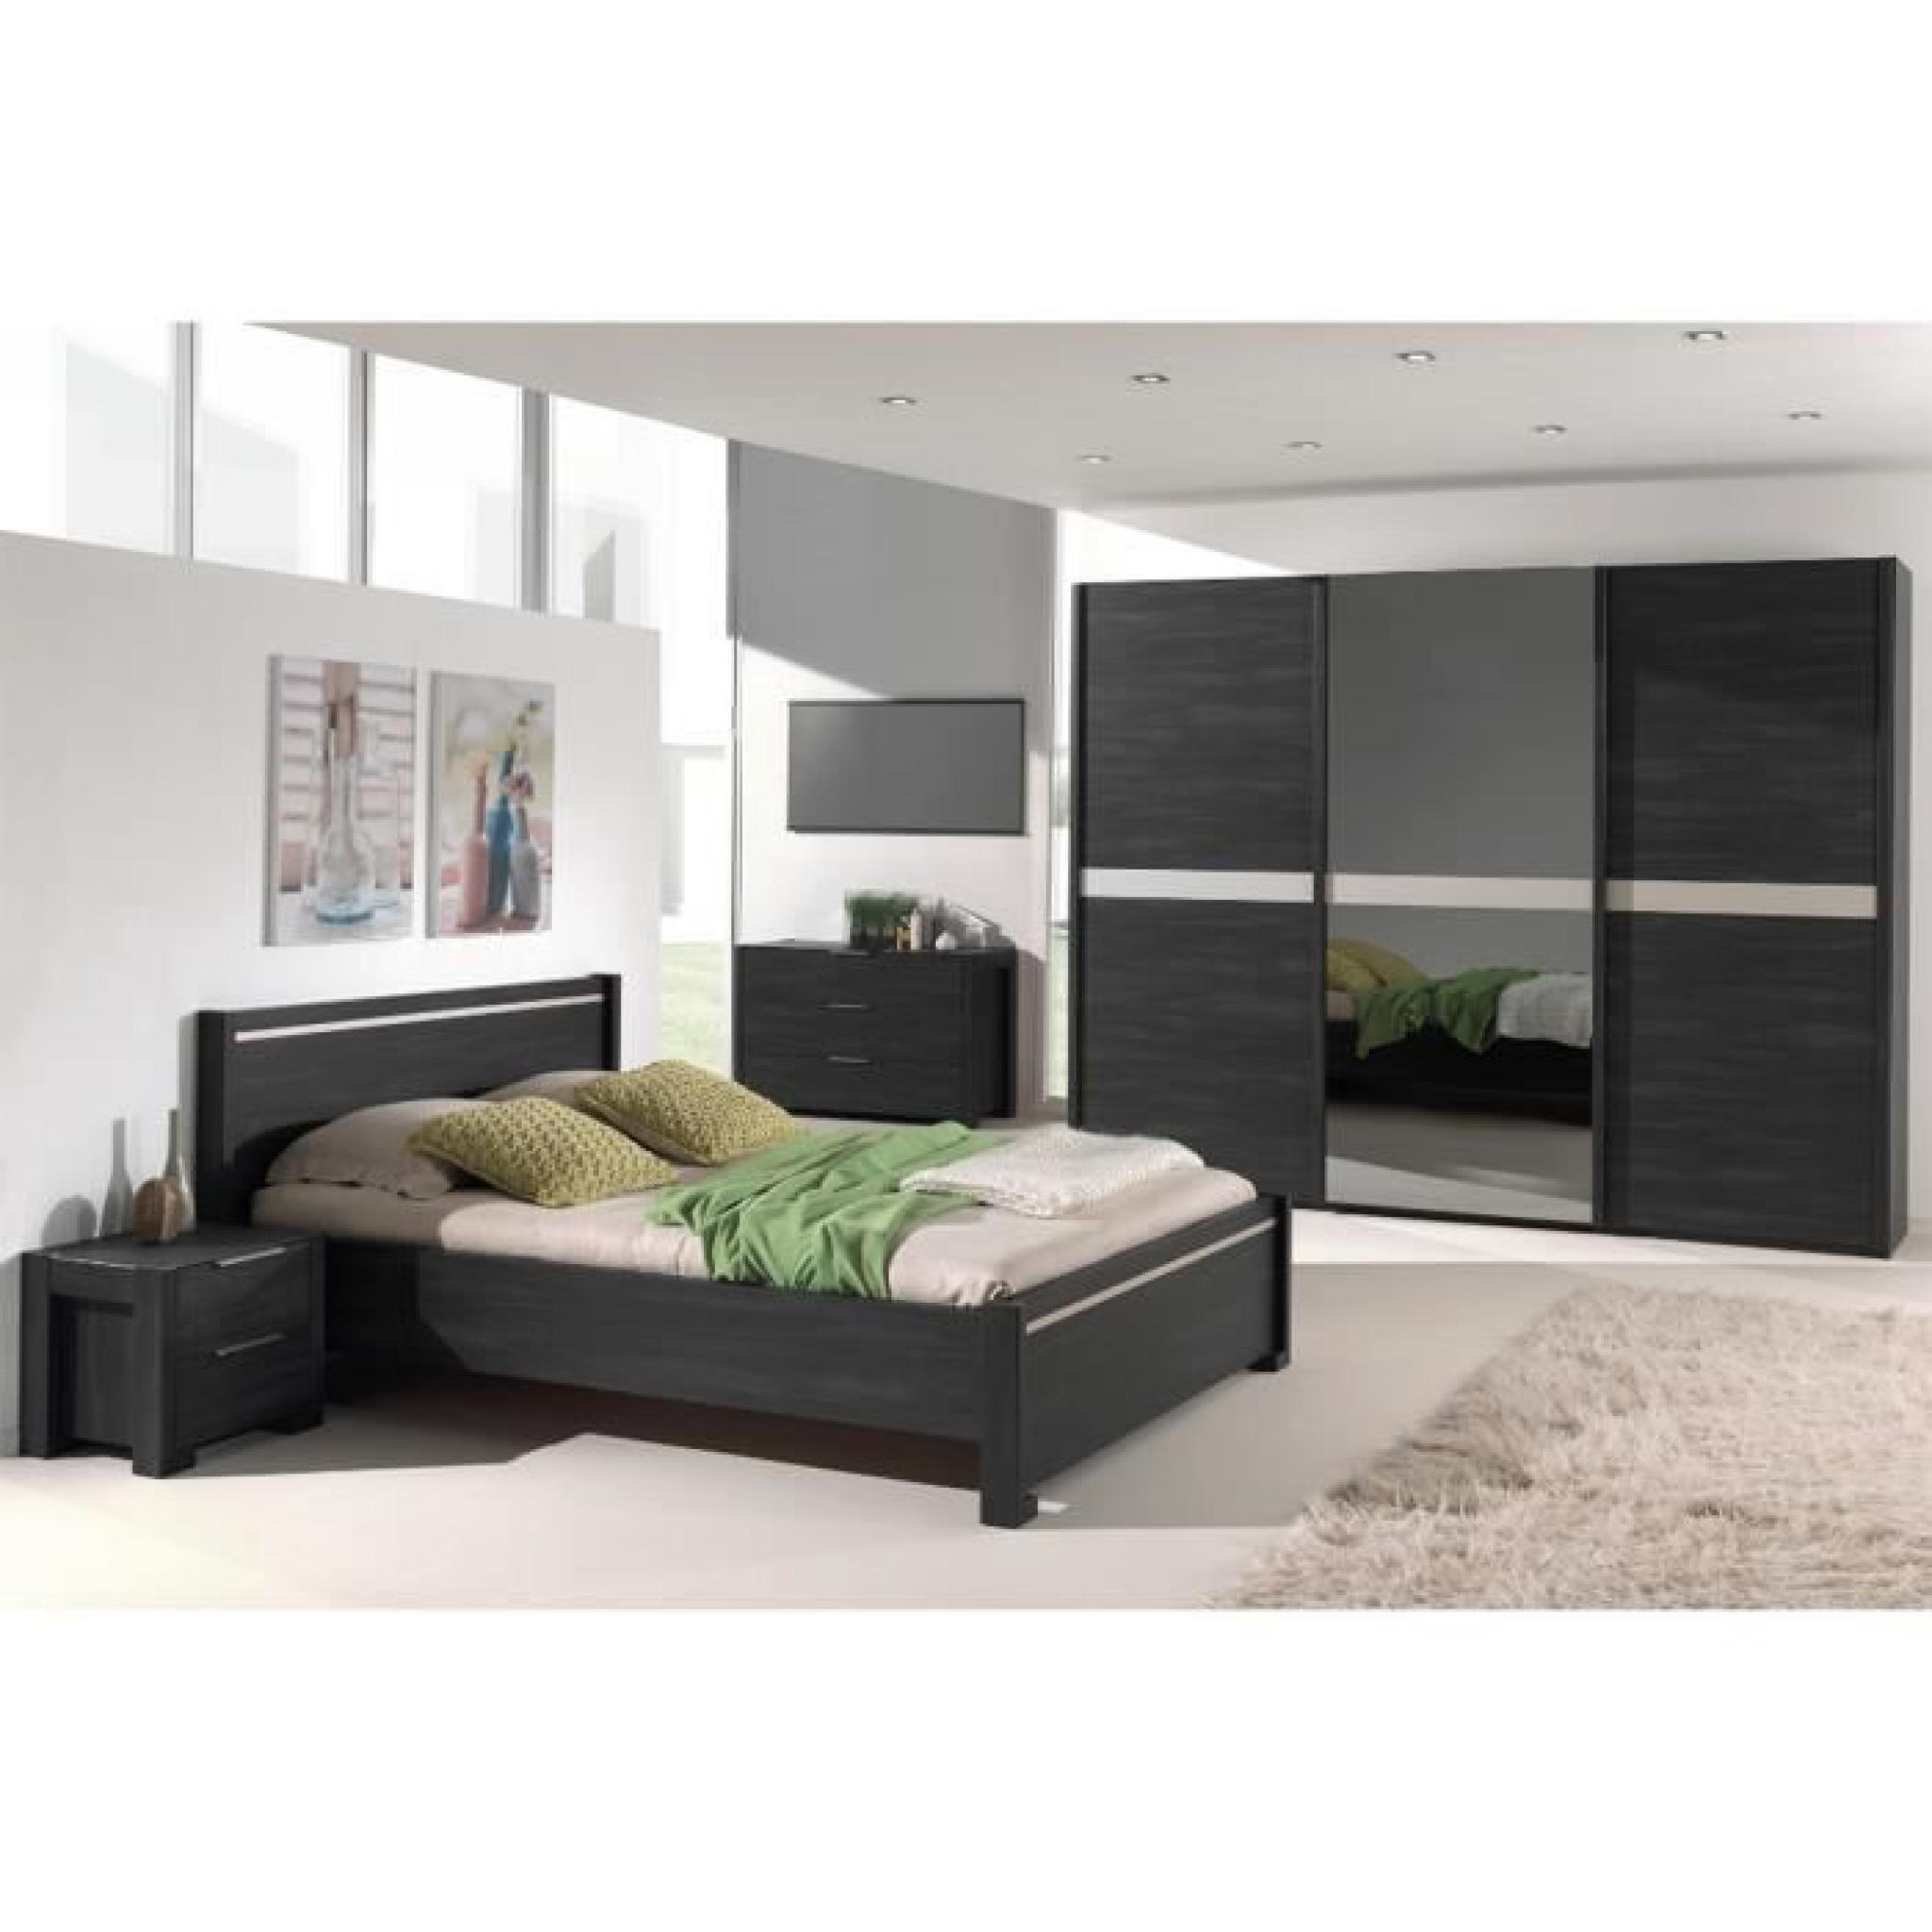 garde robe 250 cm portes coulissantes coloris ch ne. Black Bedroom Furniture Sets. Home Design Ideas